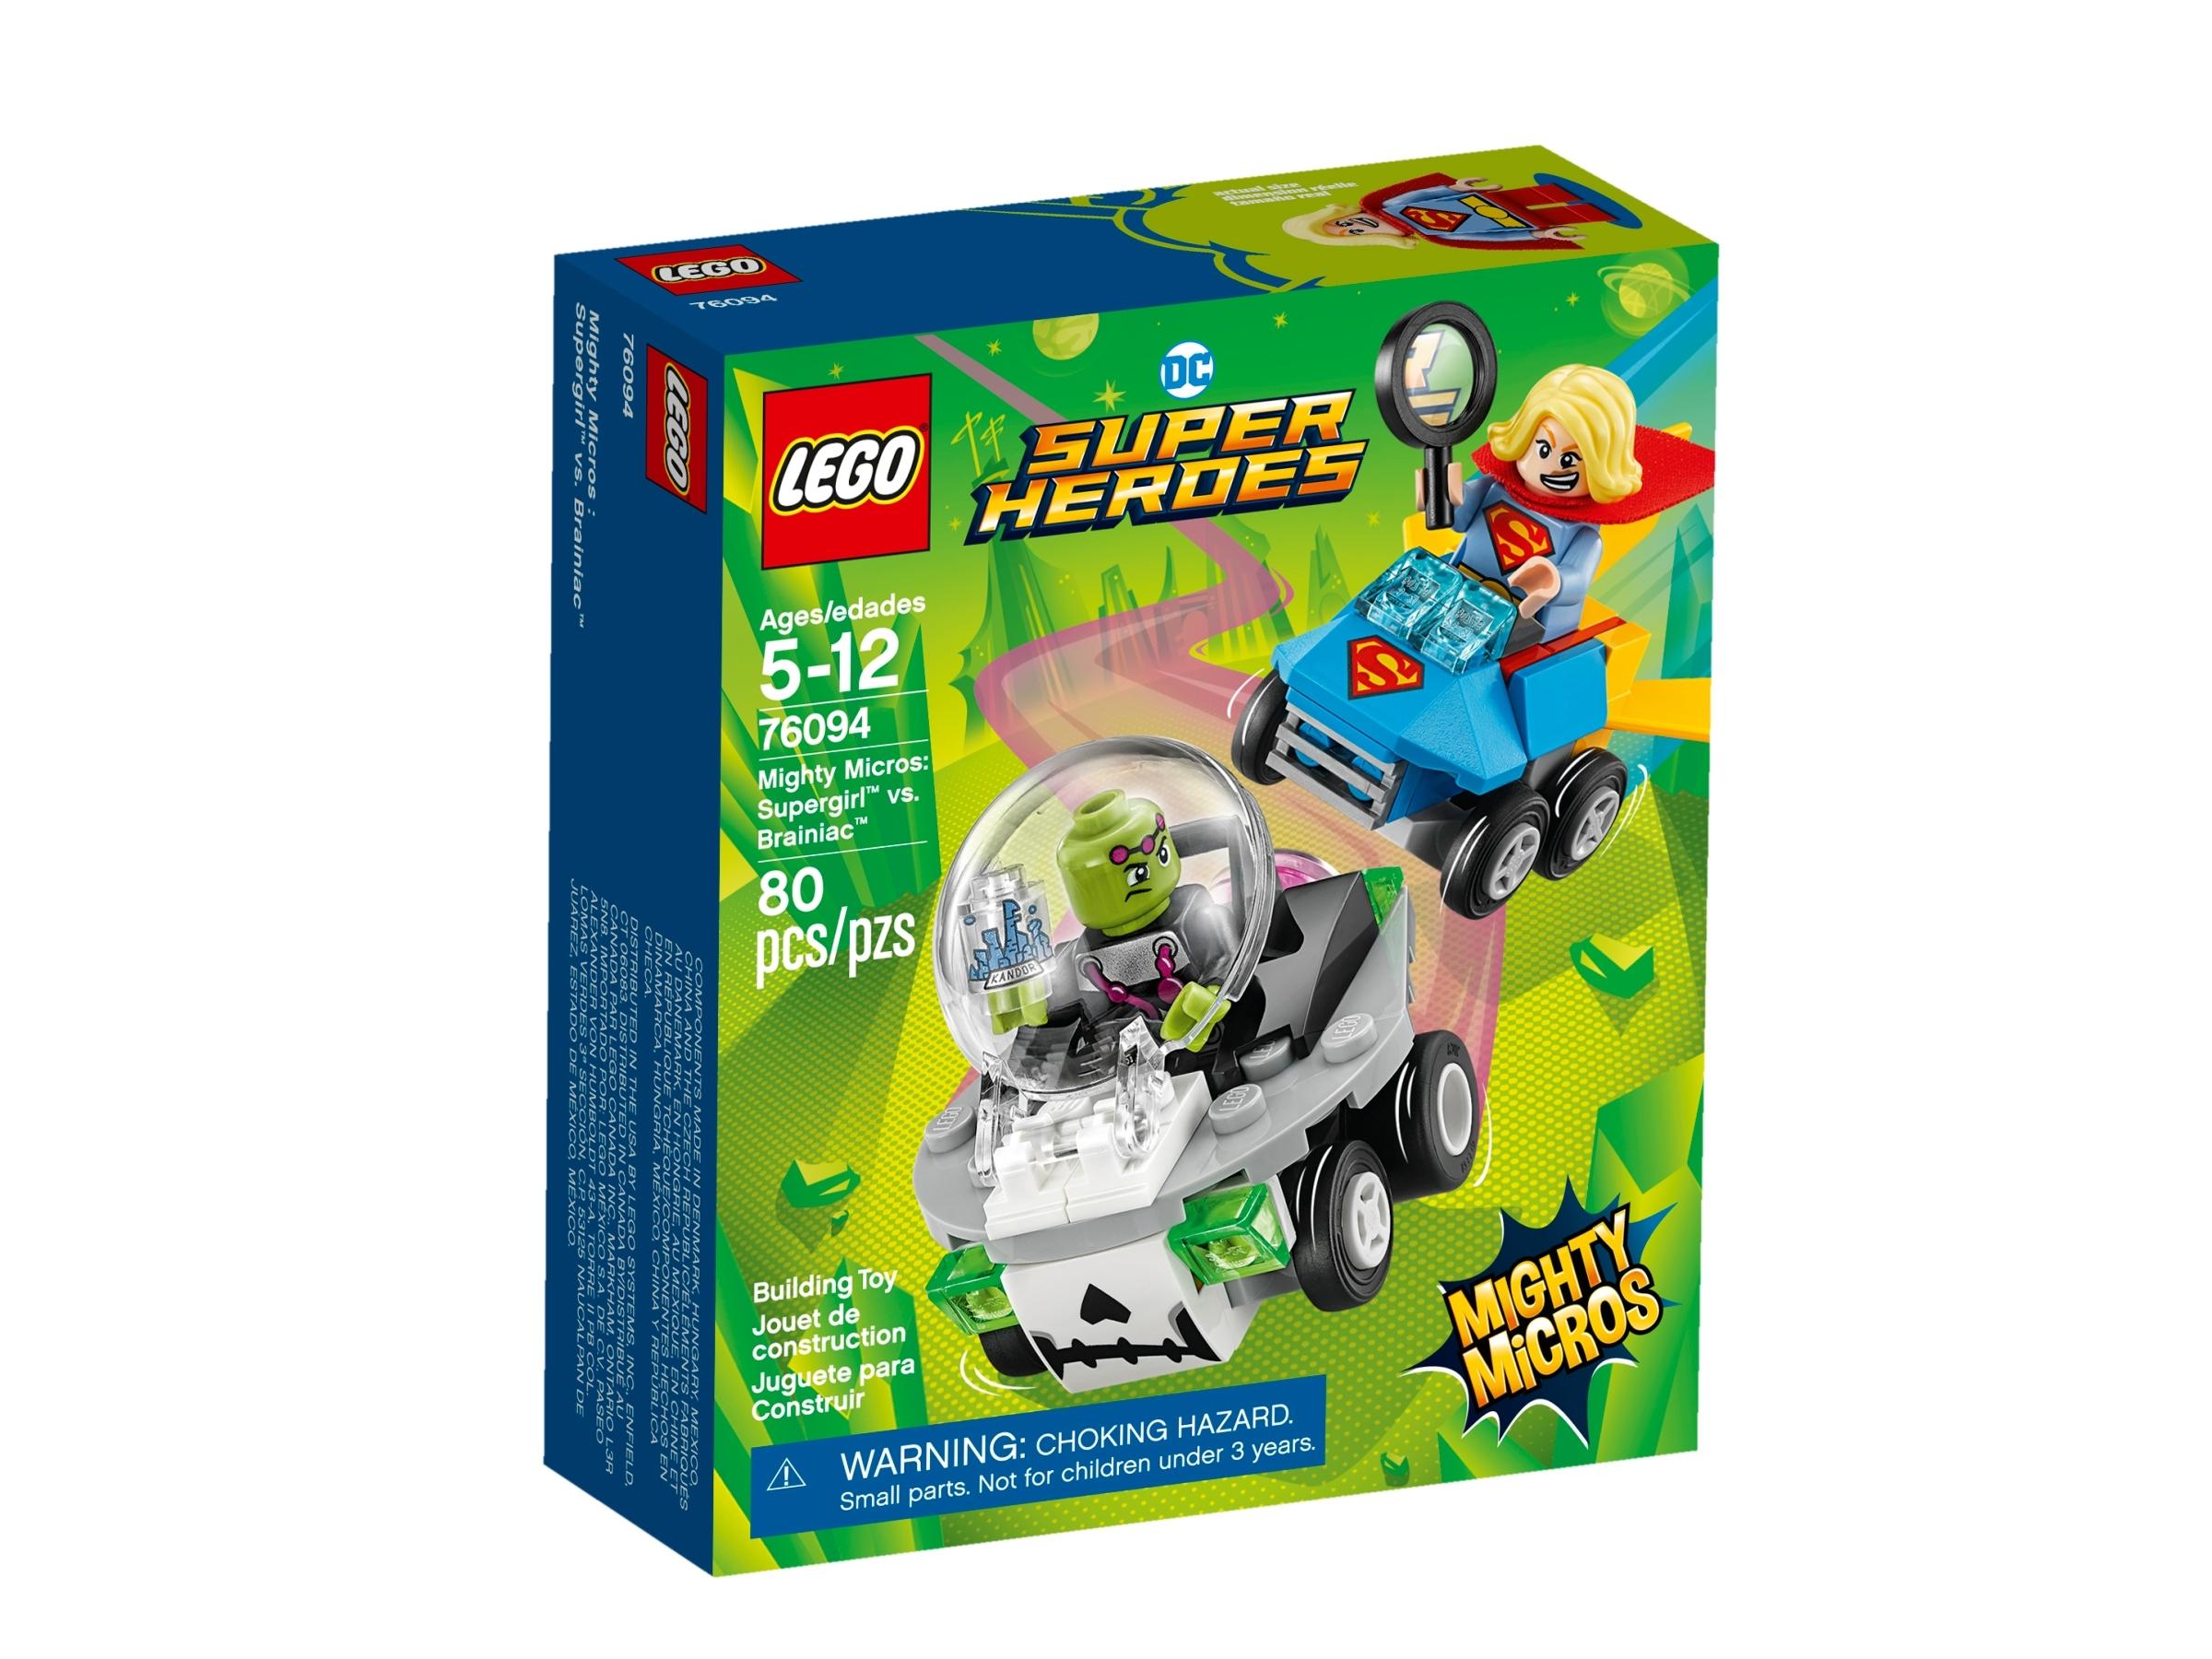 lego 76094 mighty micros supergirl vastaan brainiac